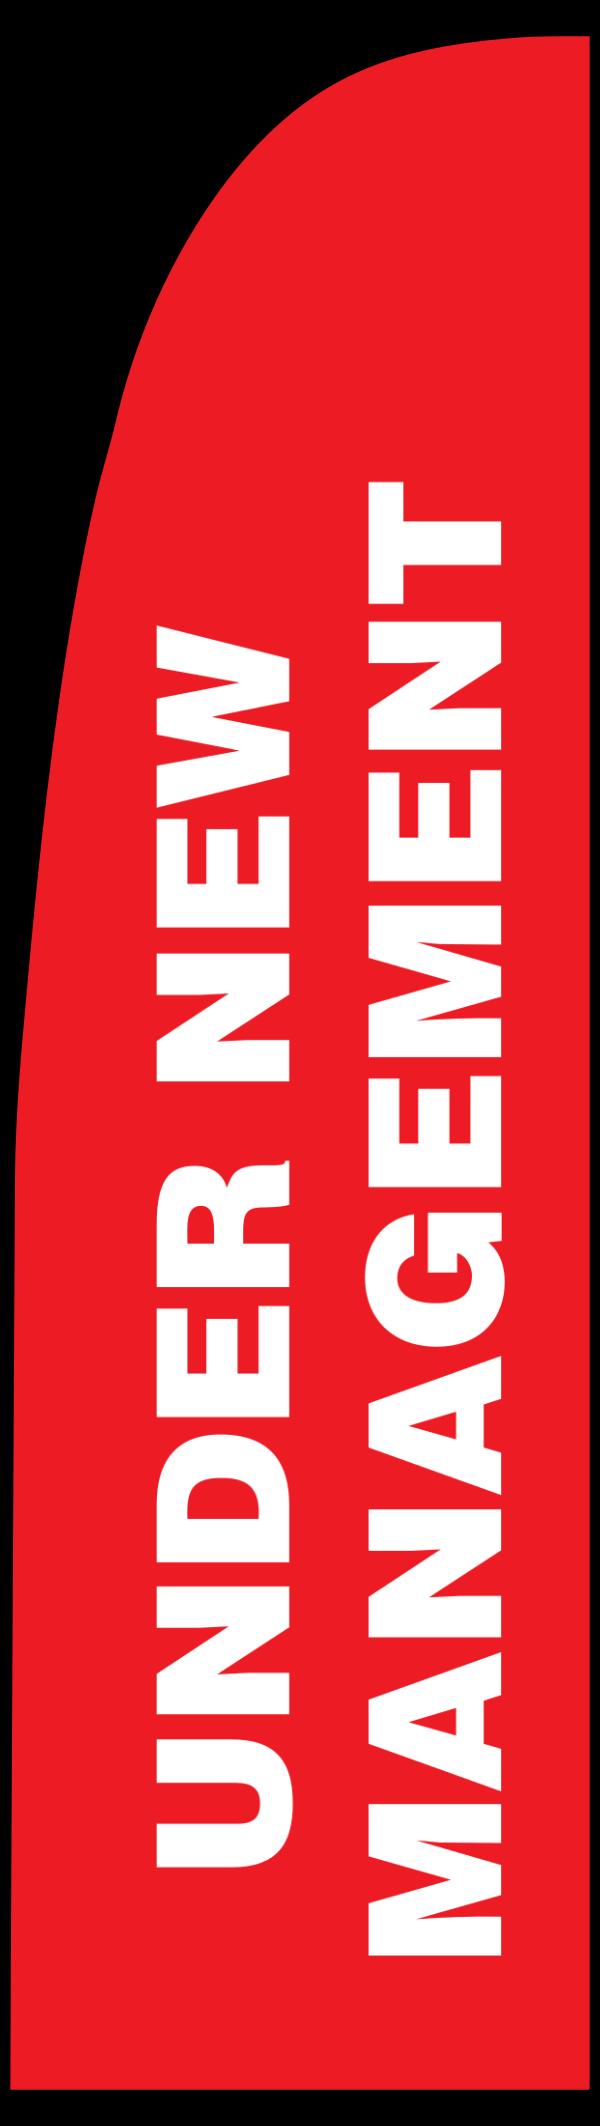 under_new_management_flag - design template - 287